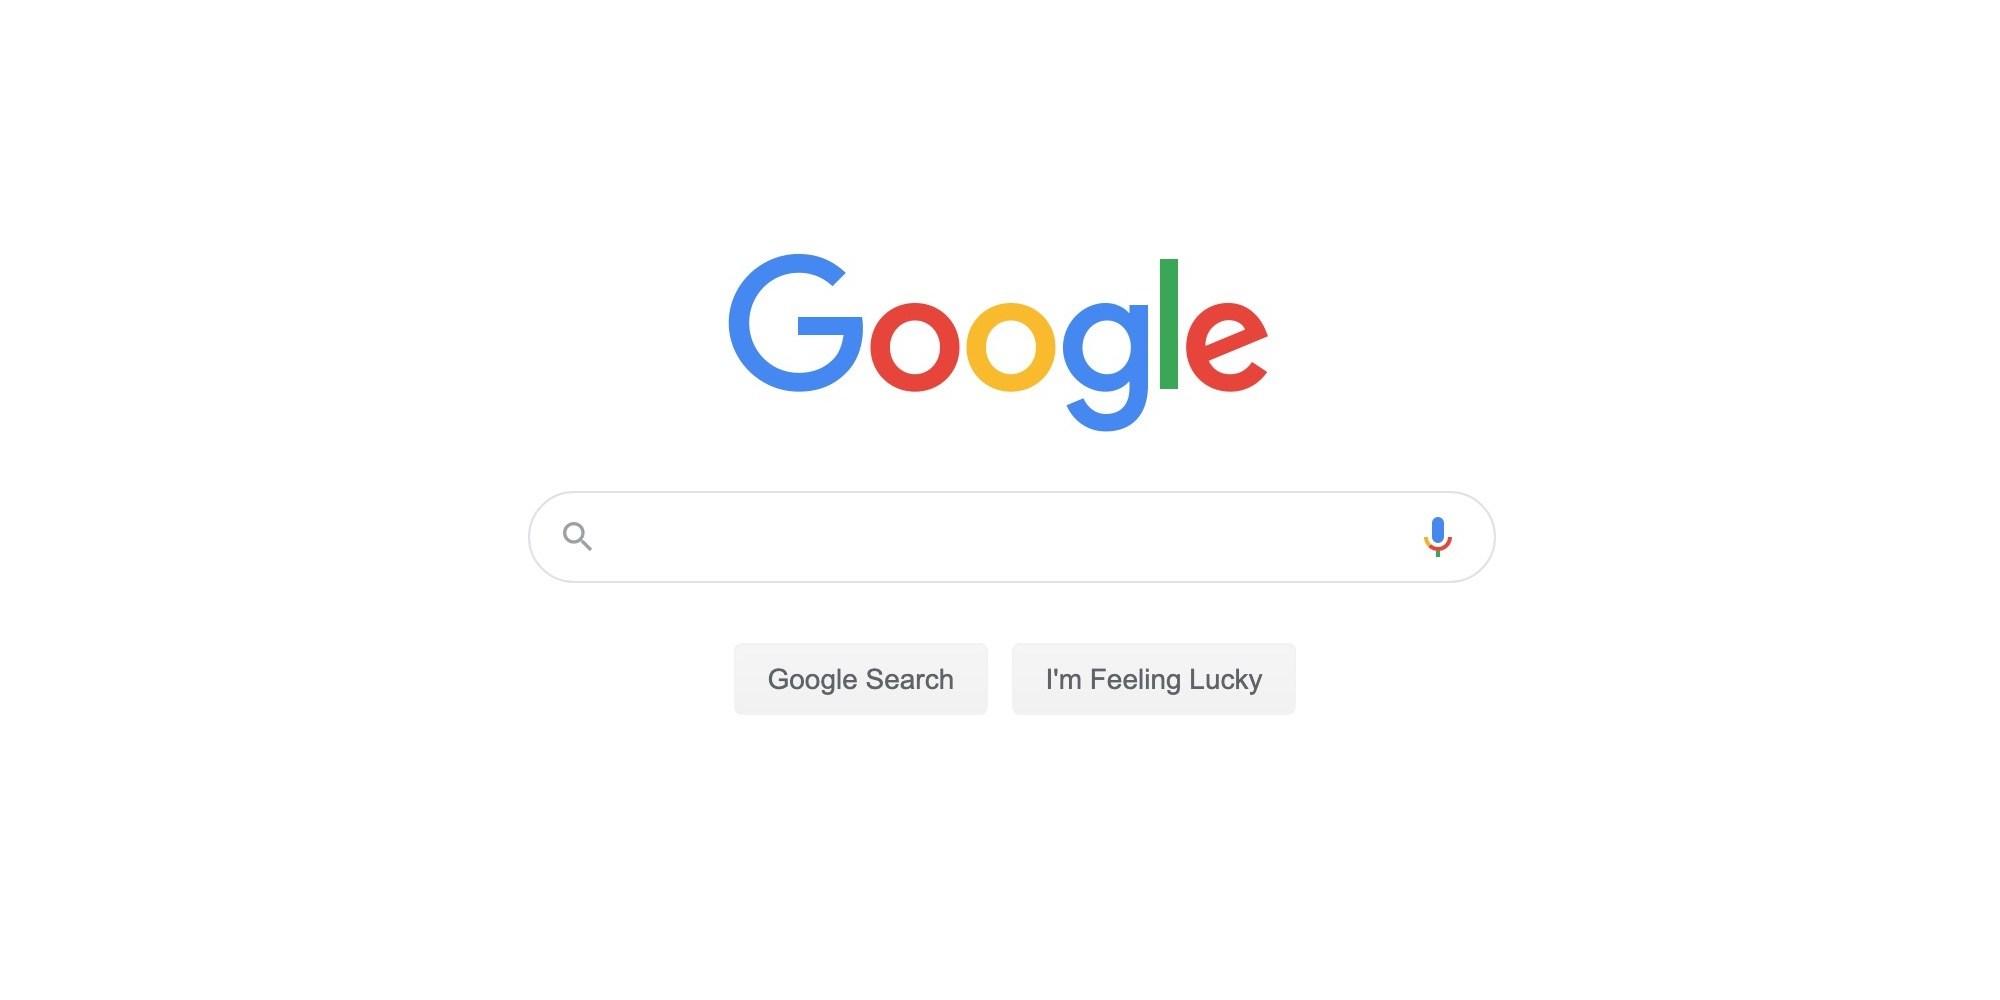 google-search-homepagep-june-19